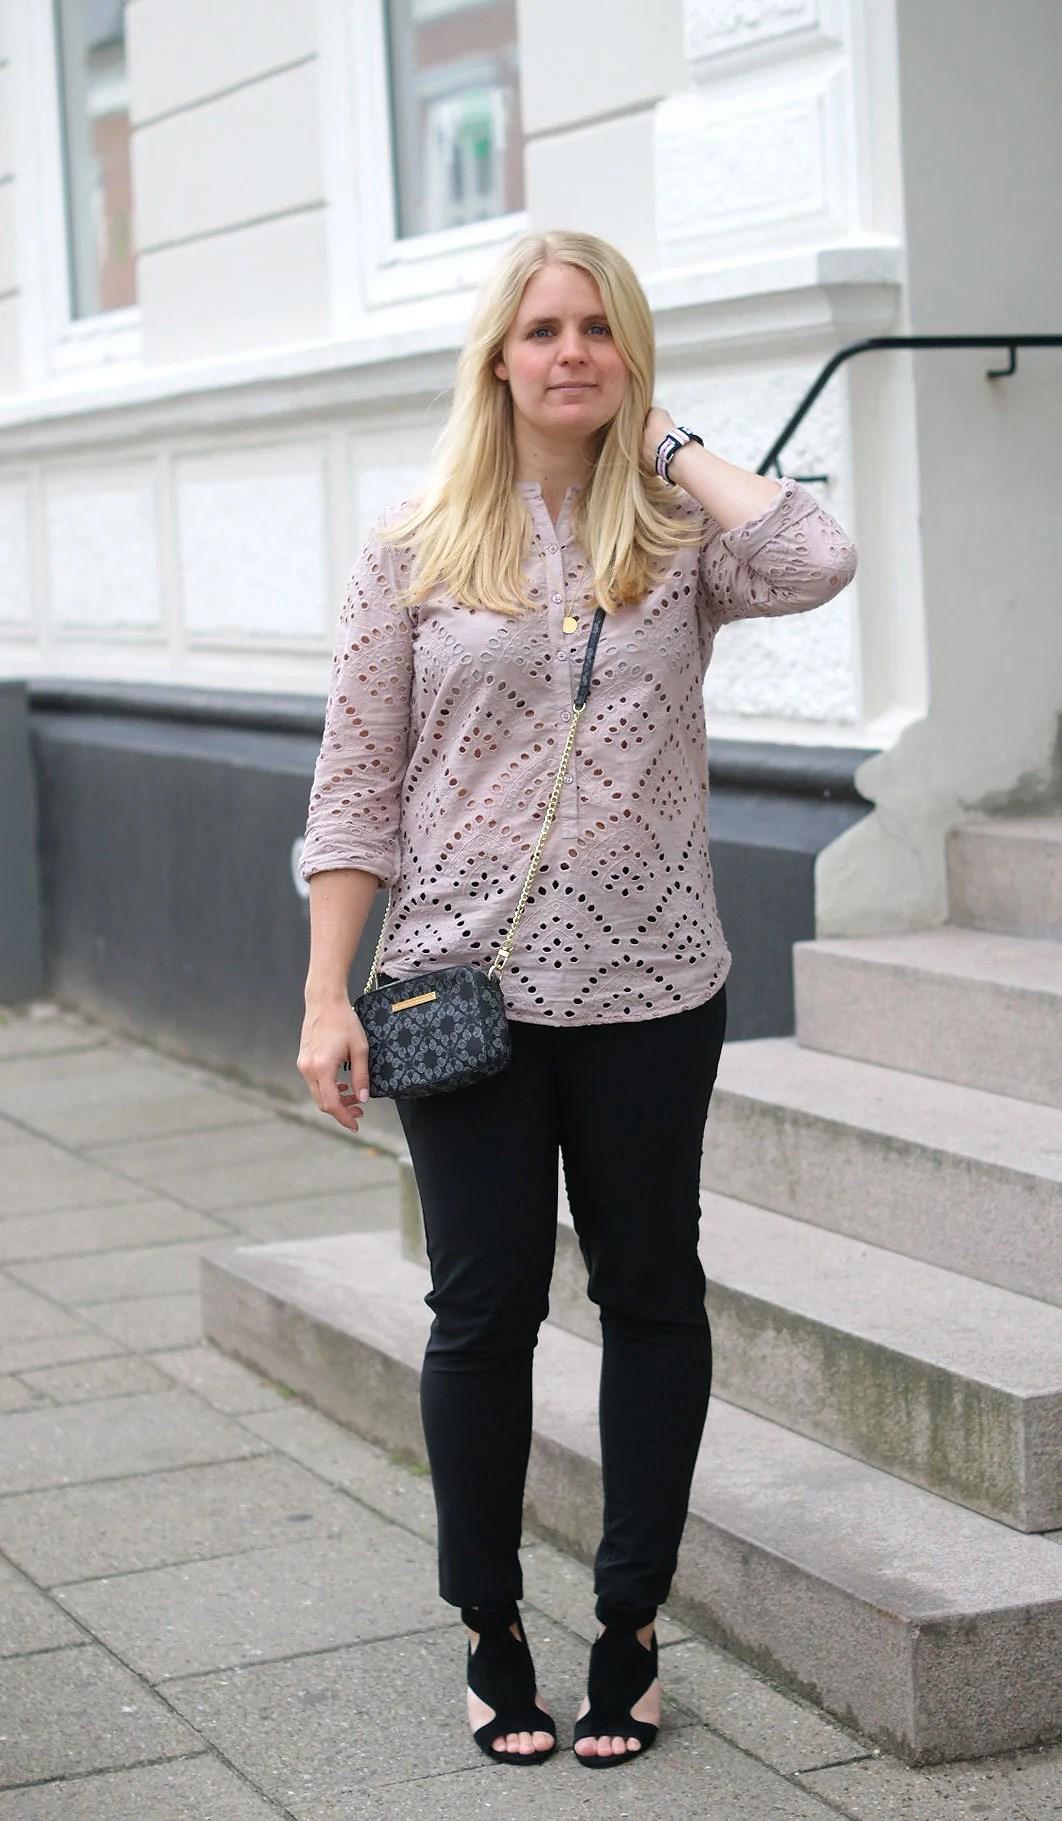 It's My Passions, Modeblogger, Dansk modeblogger, Aalborg blog, Aalborg blogger, Julie Mænnchen, Pink, Lou Lou Clothing, Lou Lou, Lou Lou skjorte, Outfit